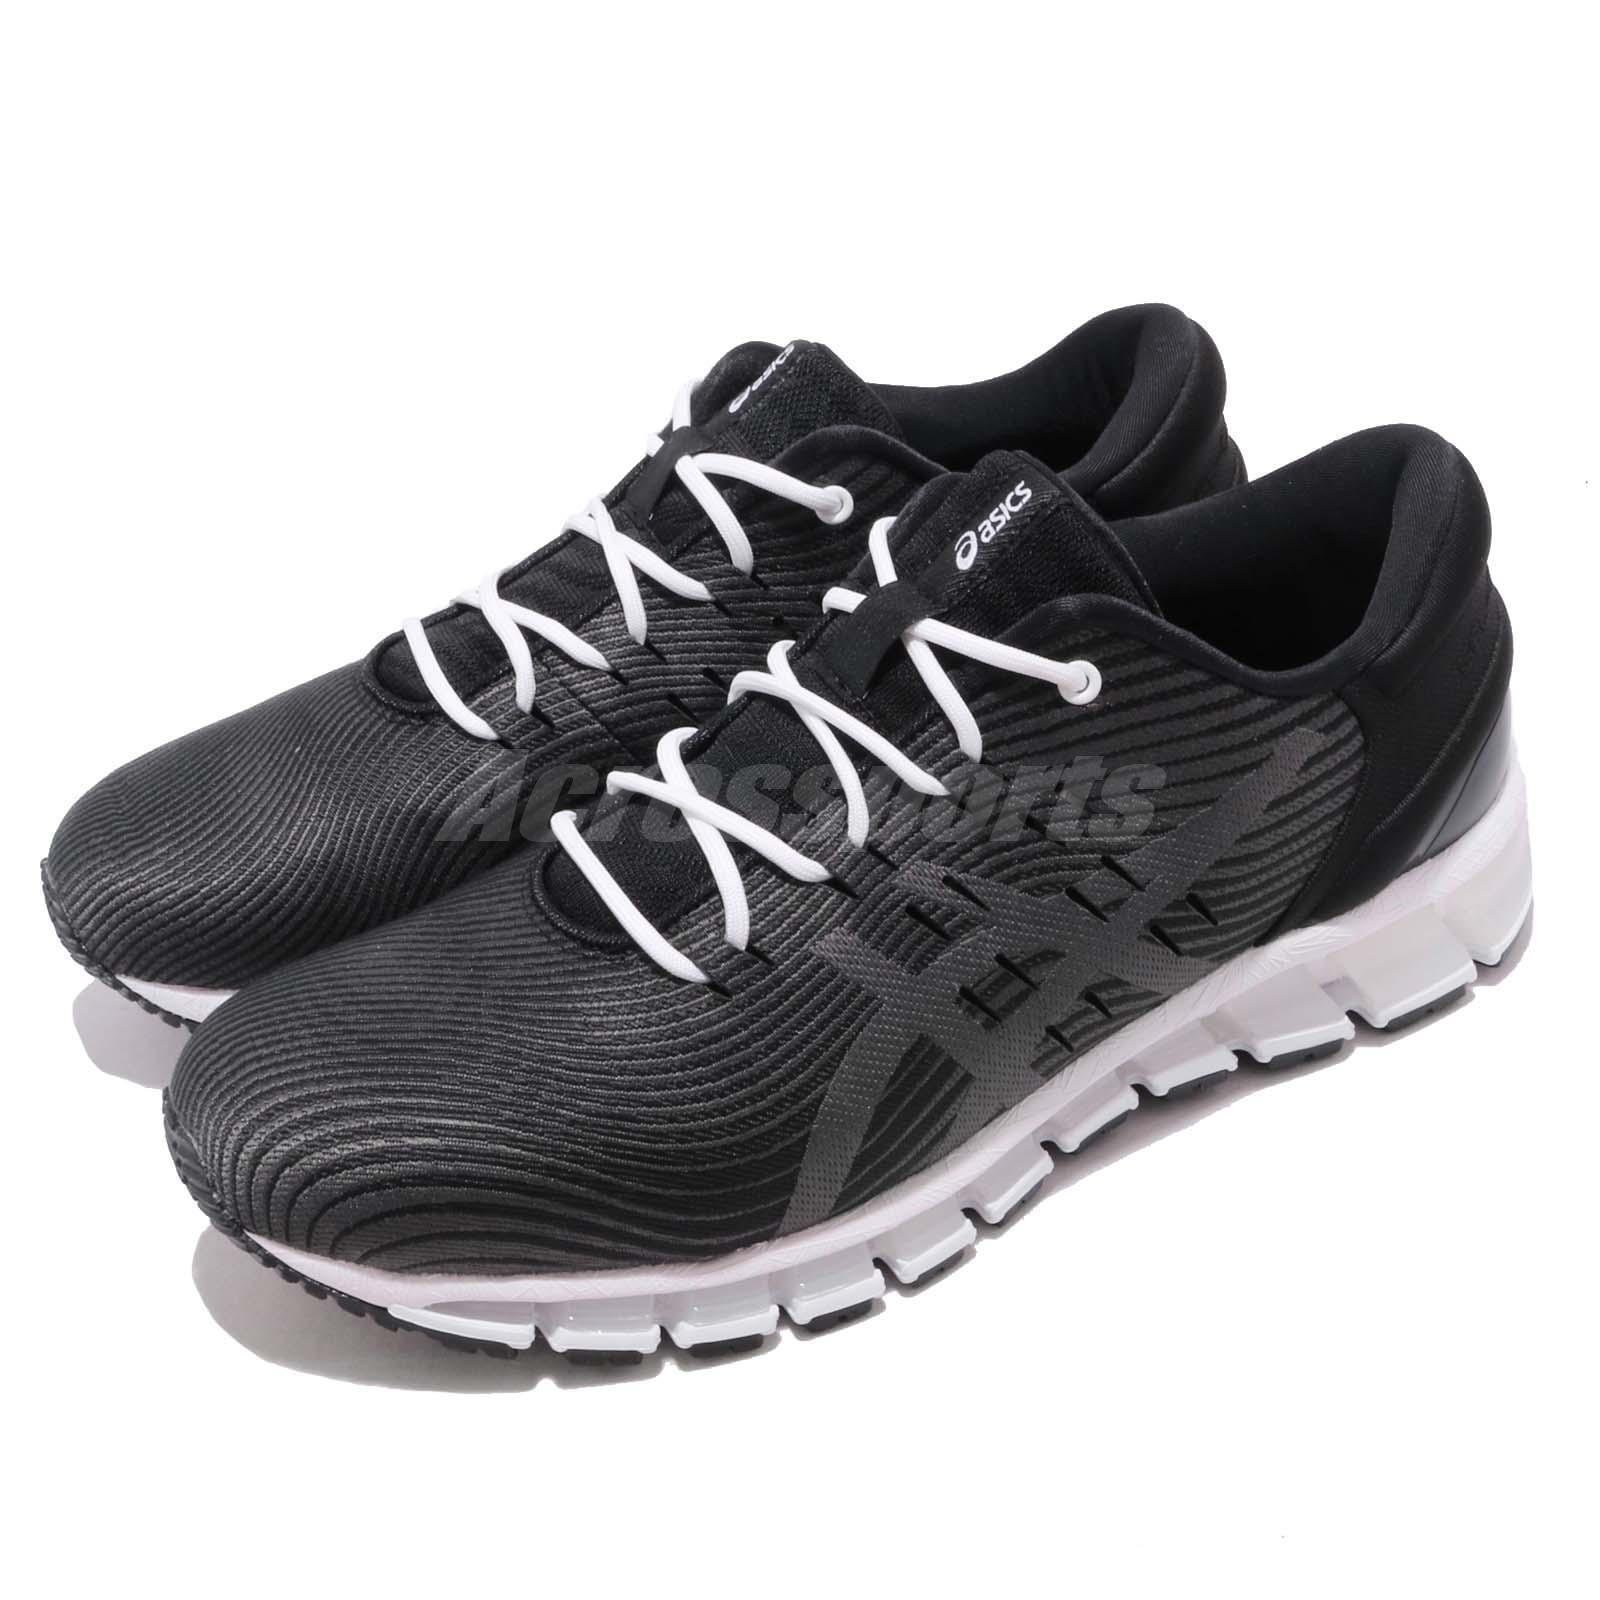 Asics Gel Quantum 360 4 negro gris blanco Men Running zapatos zapatillas 1021A028-001